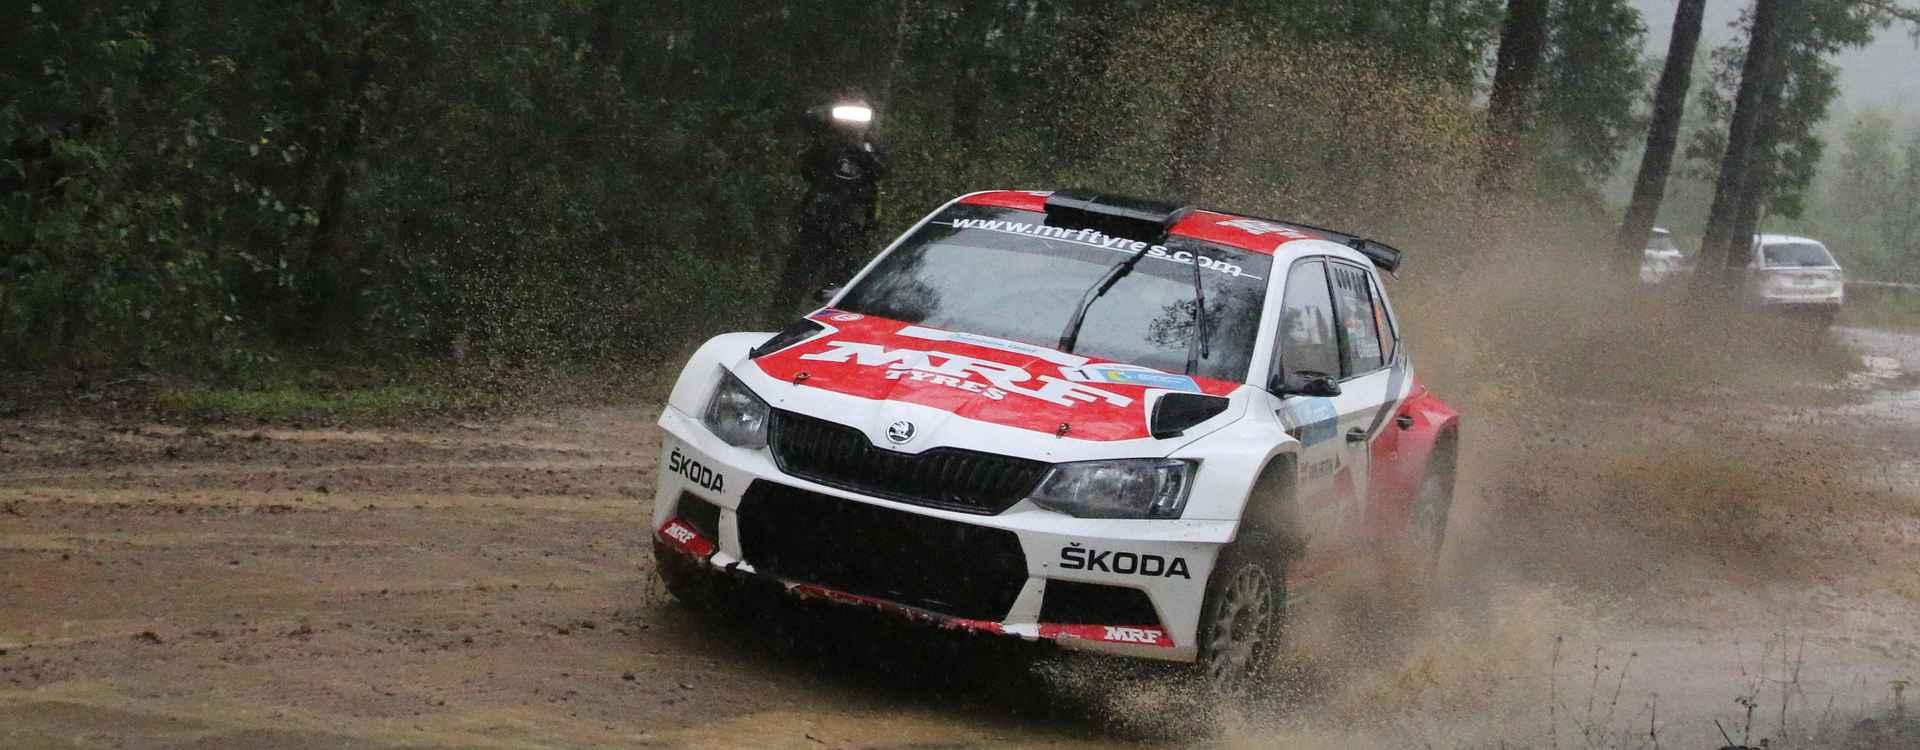 Wonderful rally weekend: ŠKODA celebrates in Australia as well